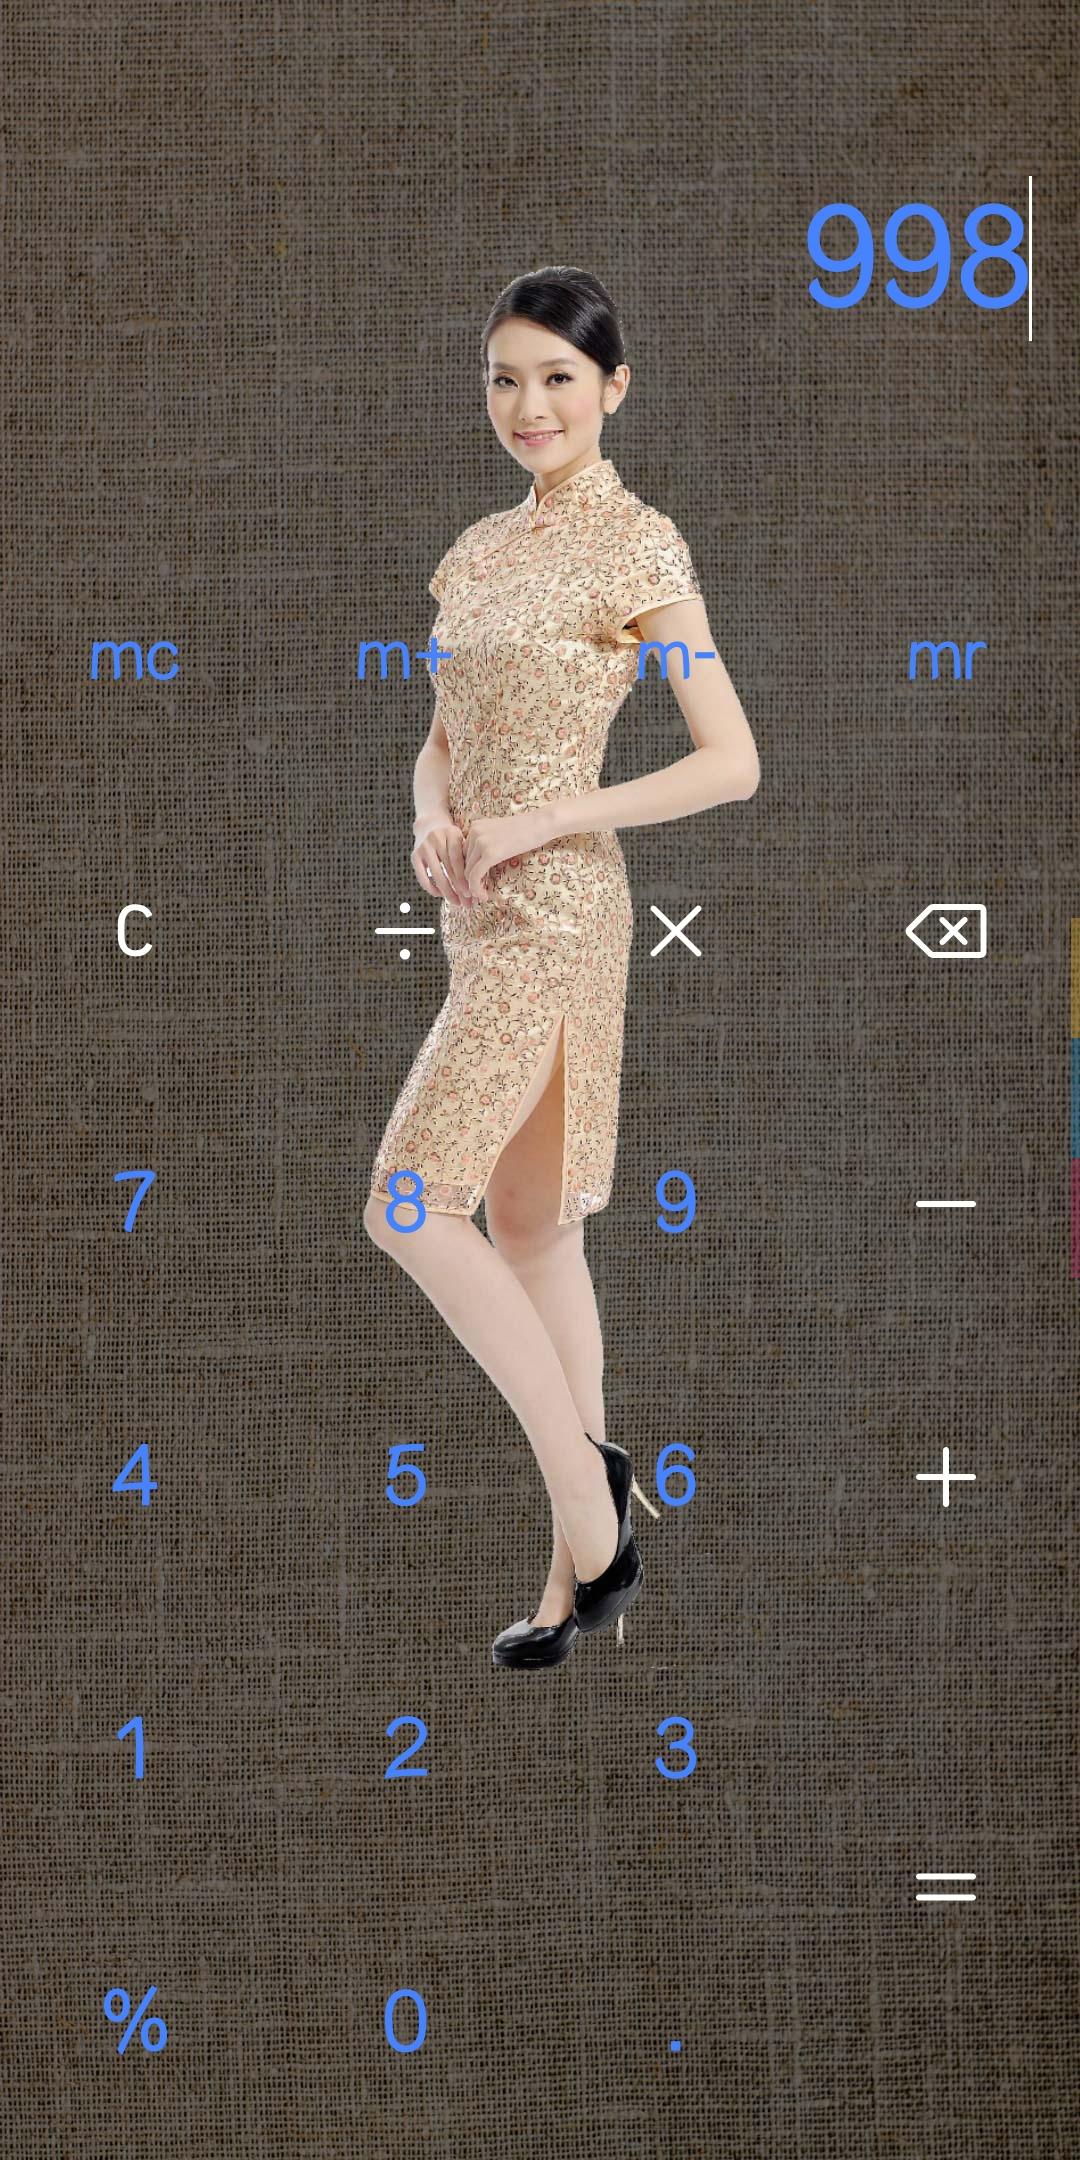 Screenshot_20190318_135838_com.android.calculator2.jpg